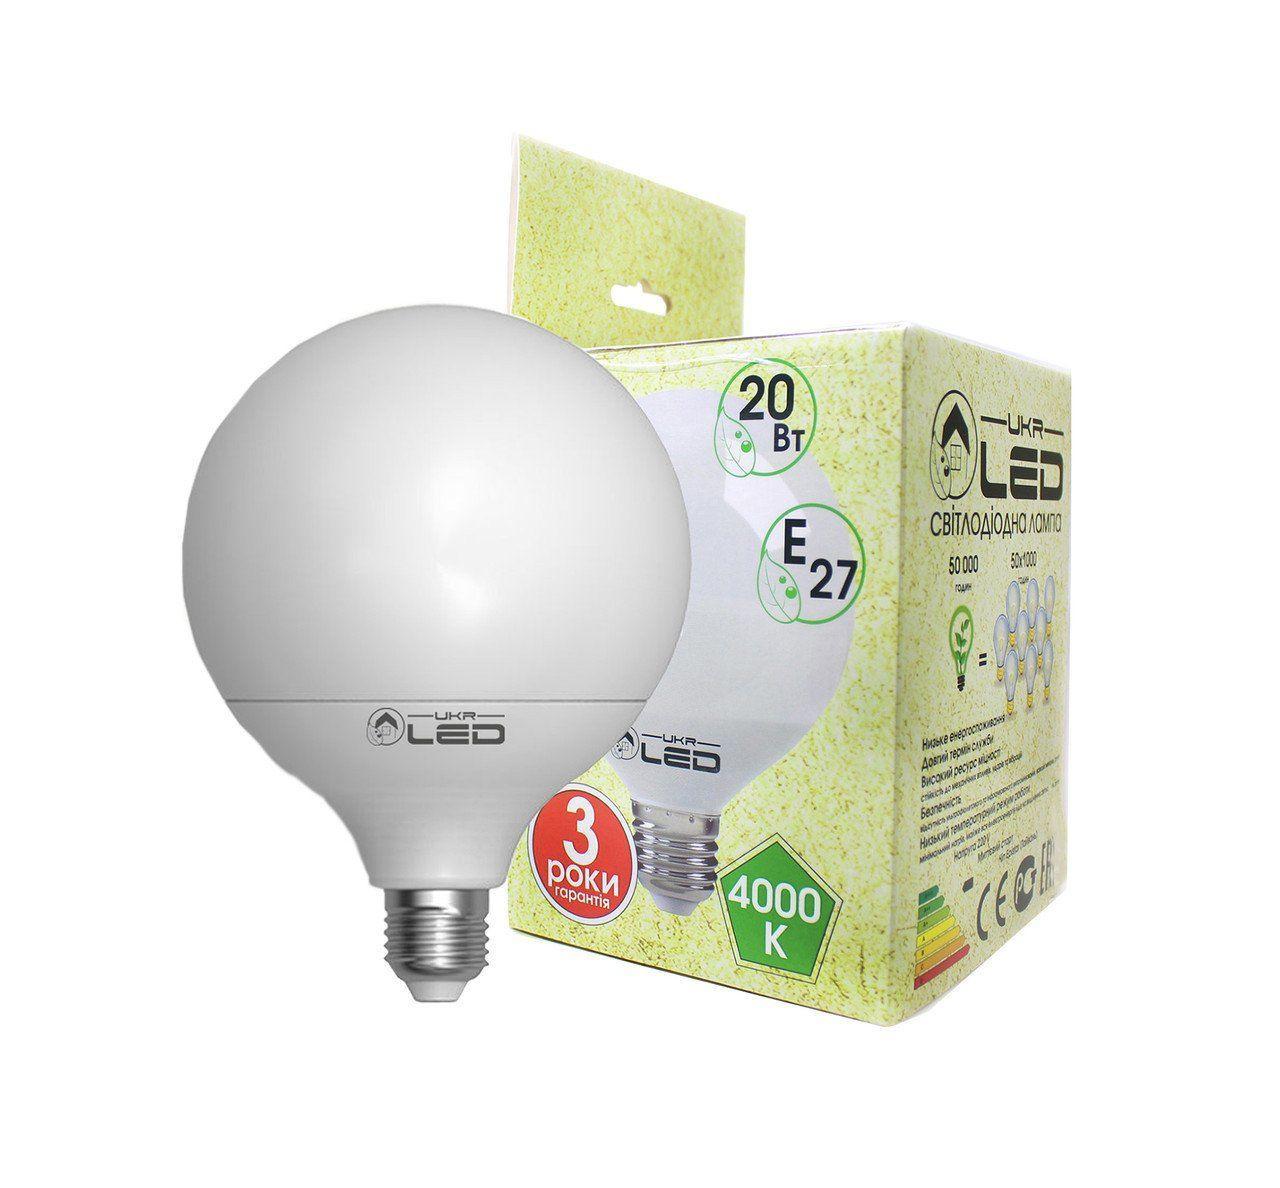 Светодиодная лампа UkrLed Е27 20W (Глобус) 4000К